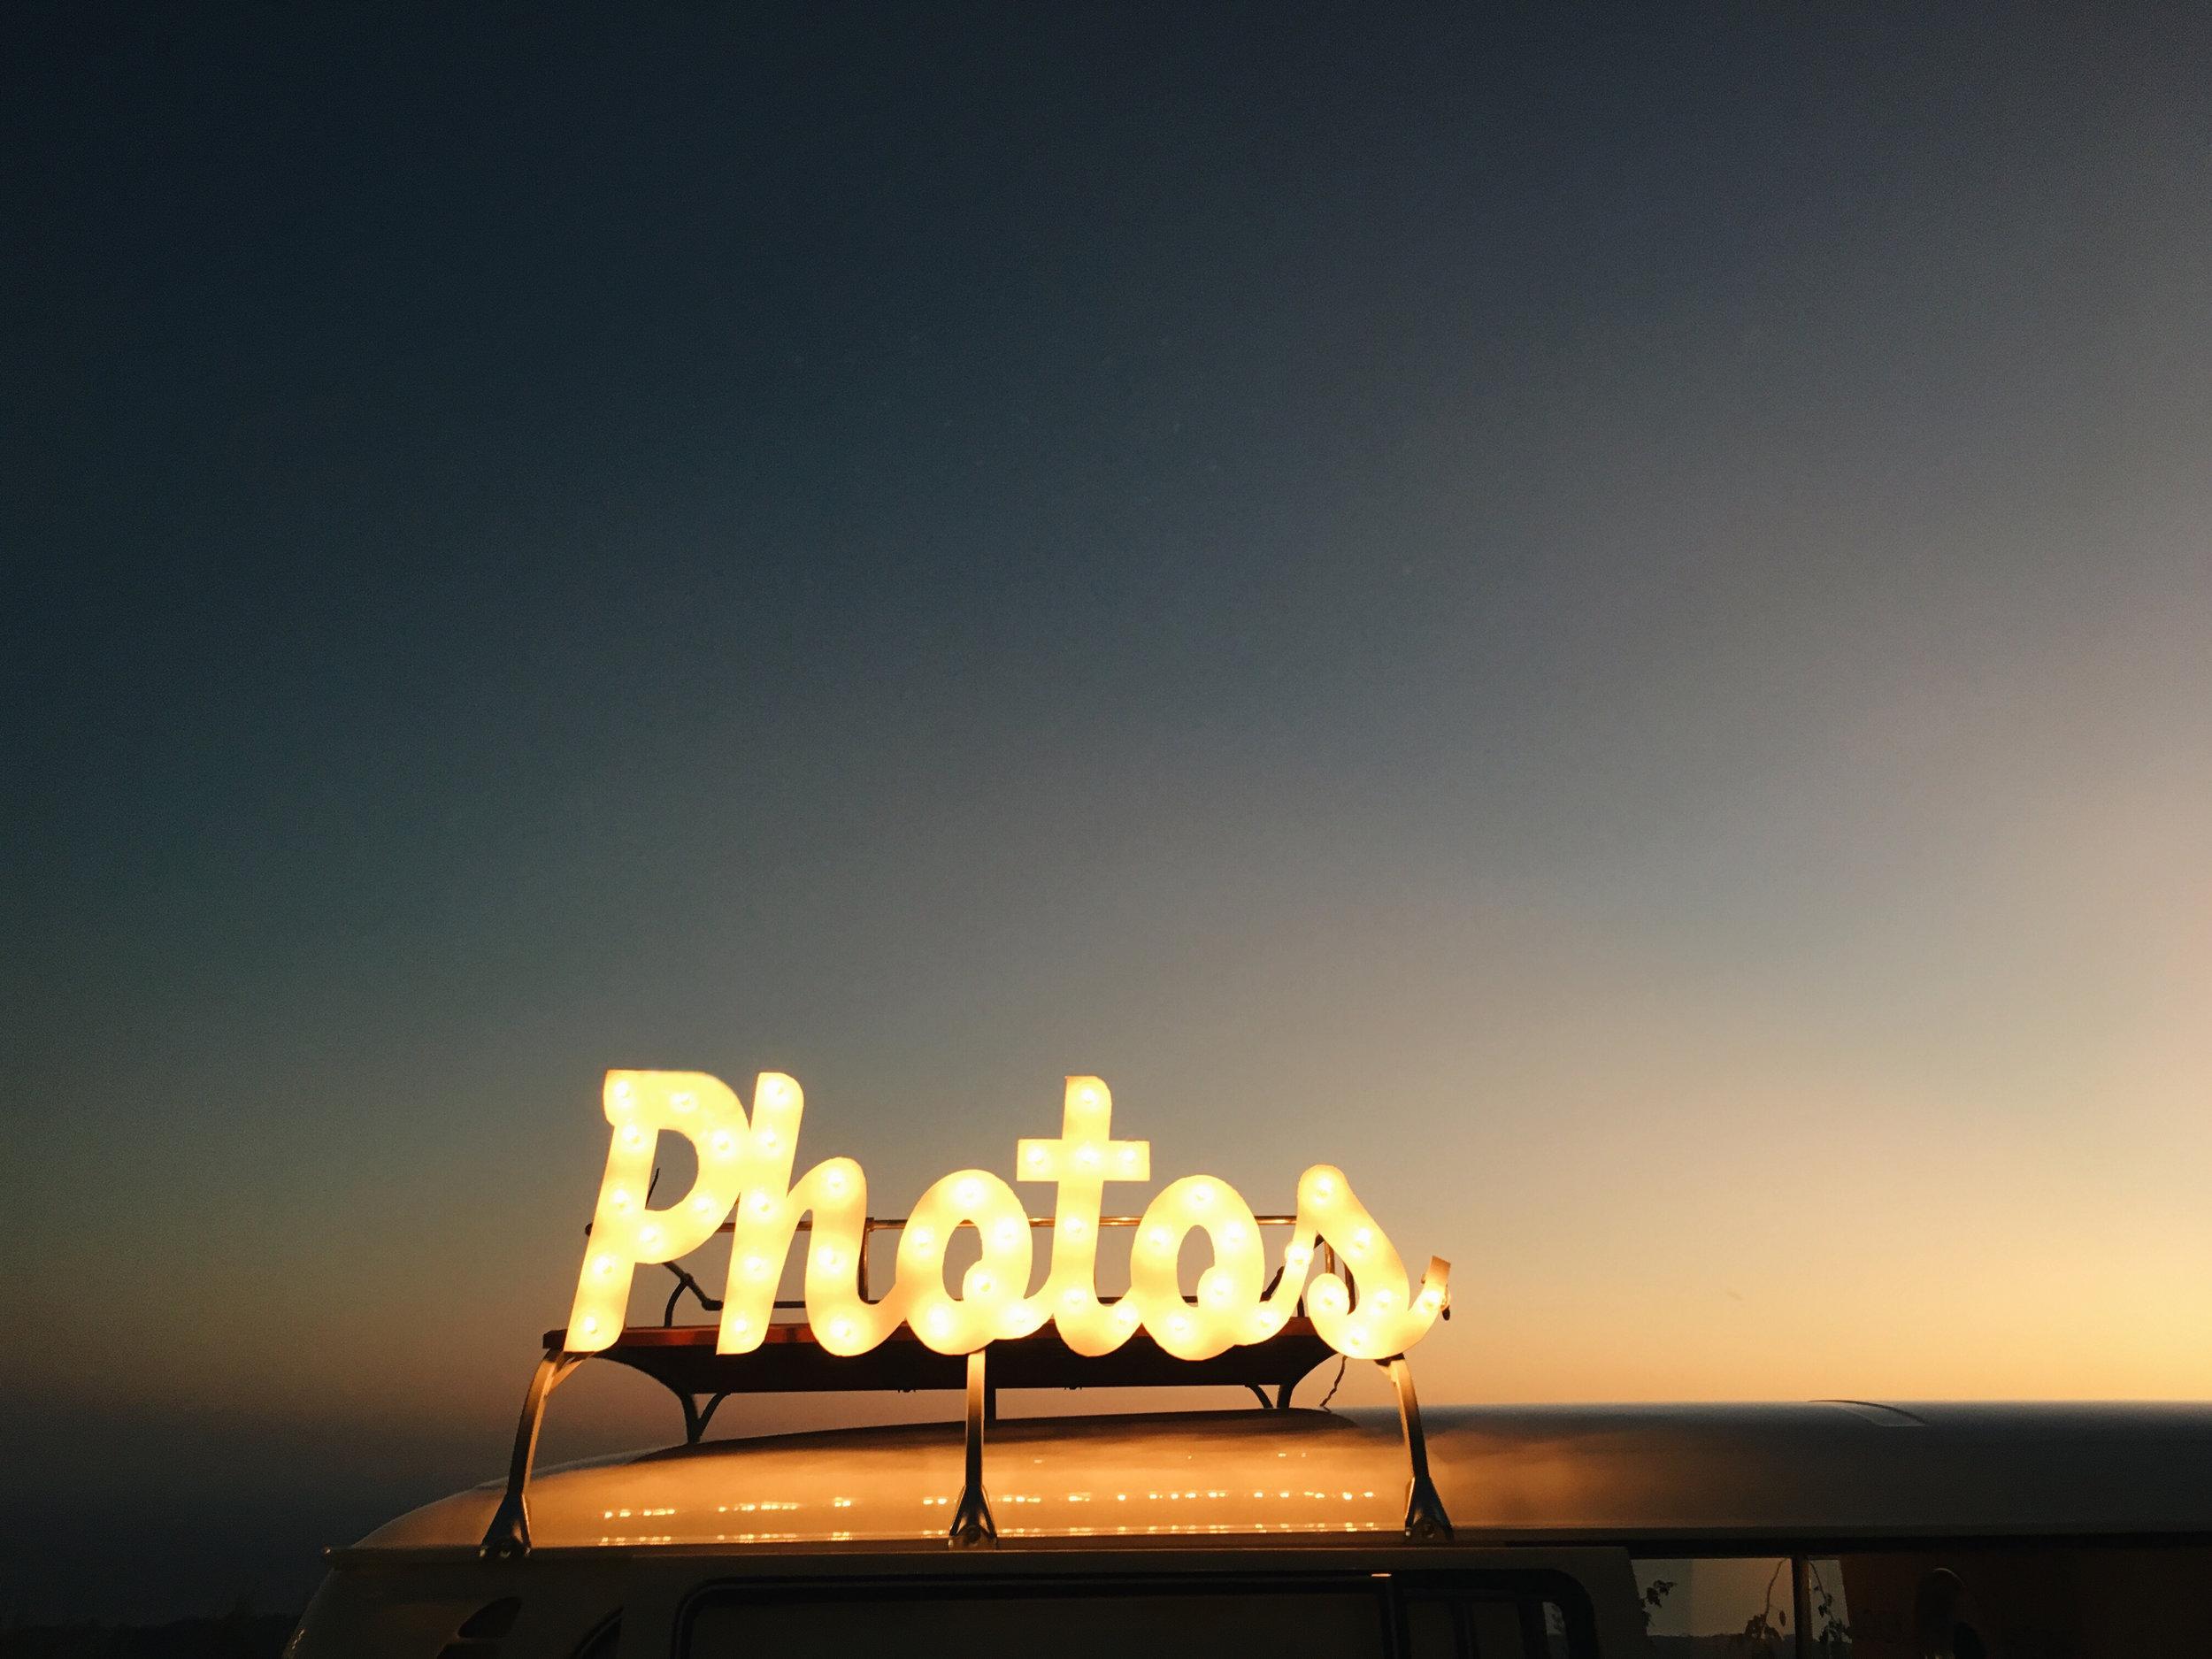 photosign.jpg